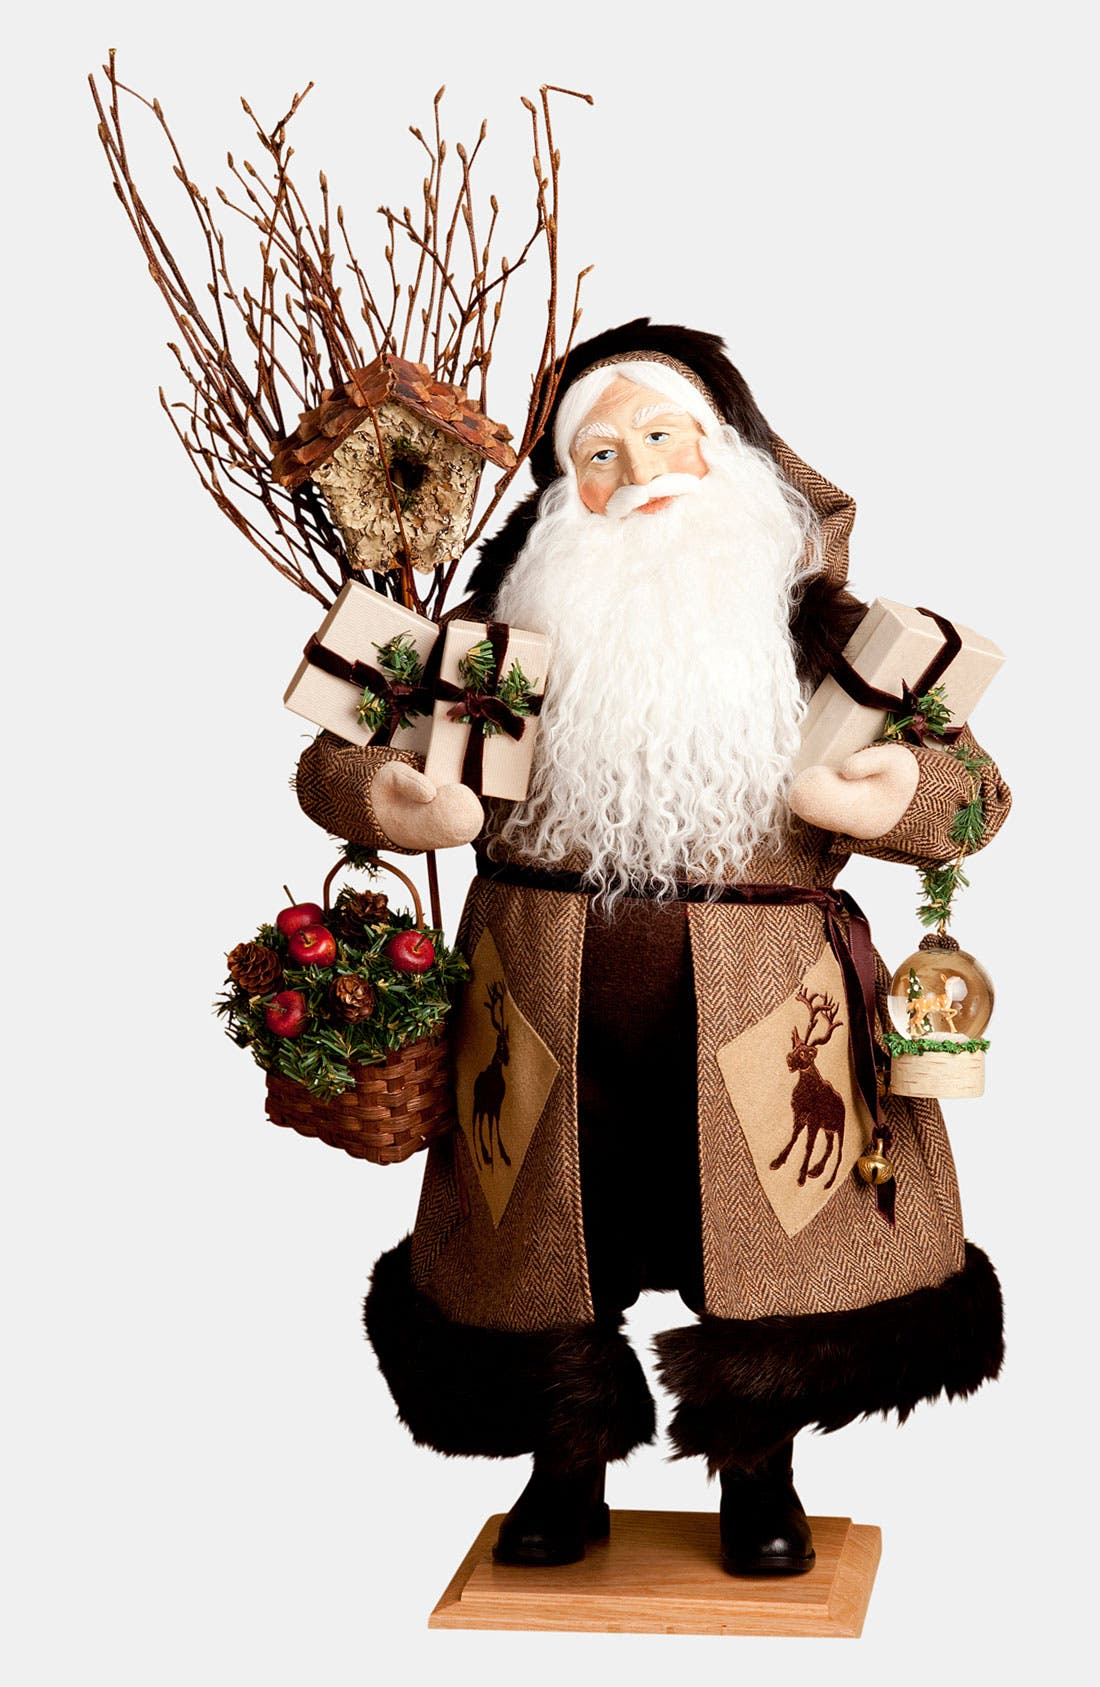 Alternate Image 1 Selected - Lynn Haney 'Forest Woods' Santa Figurine